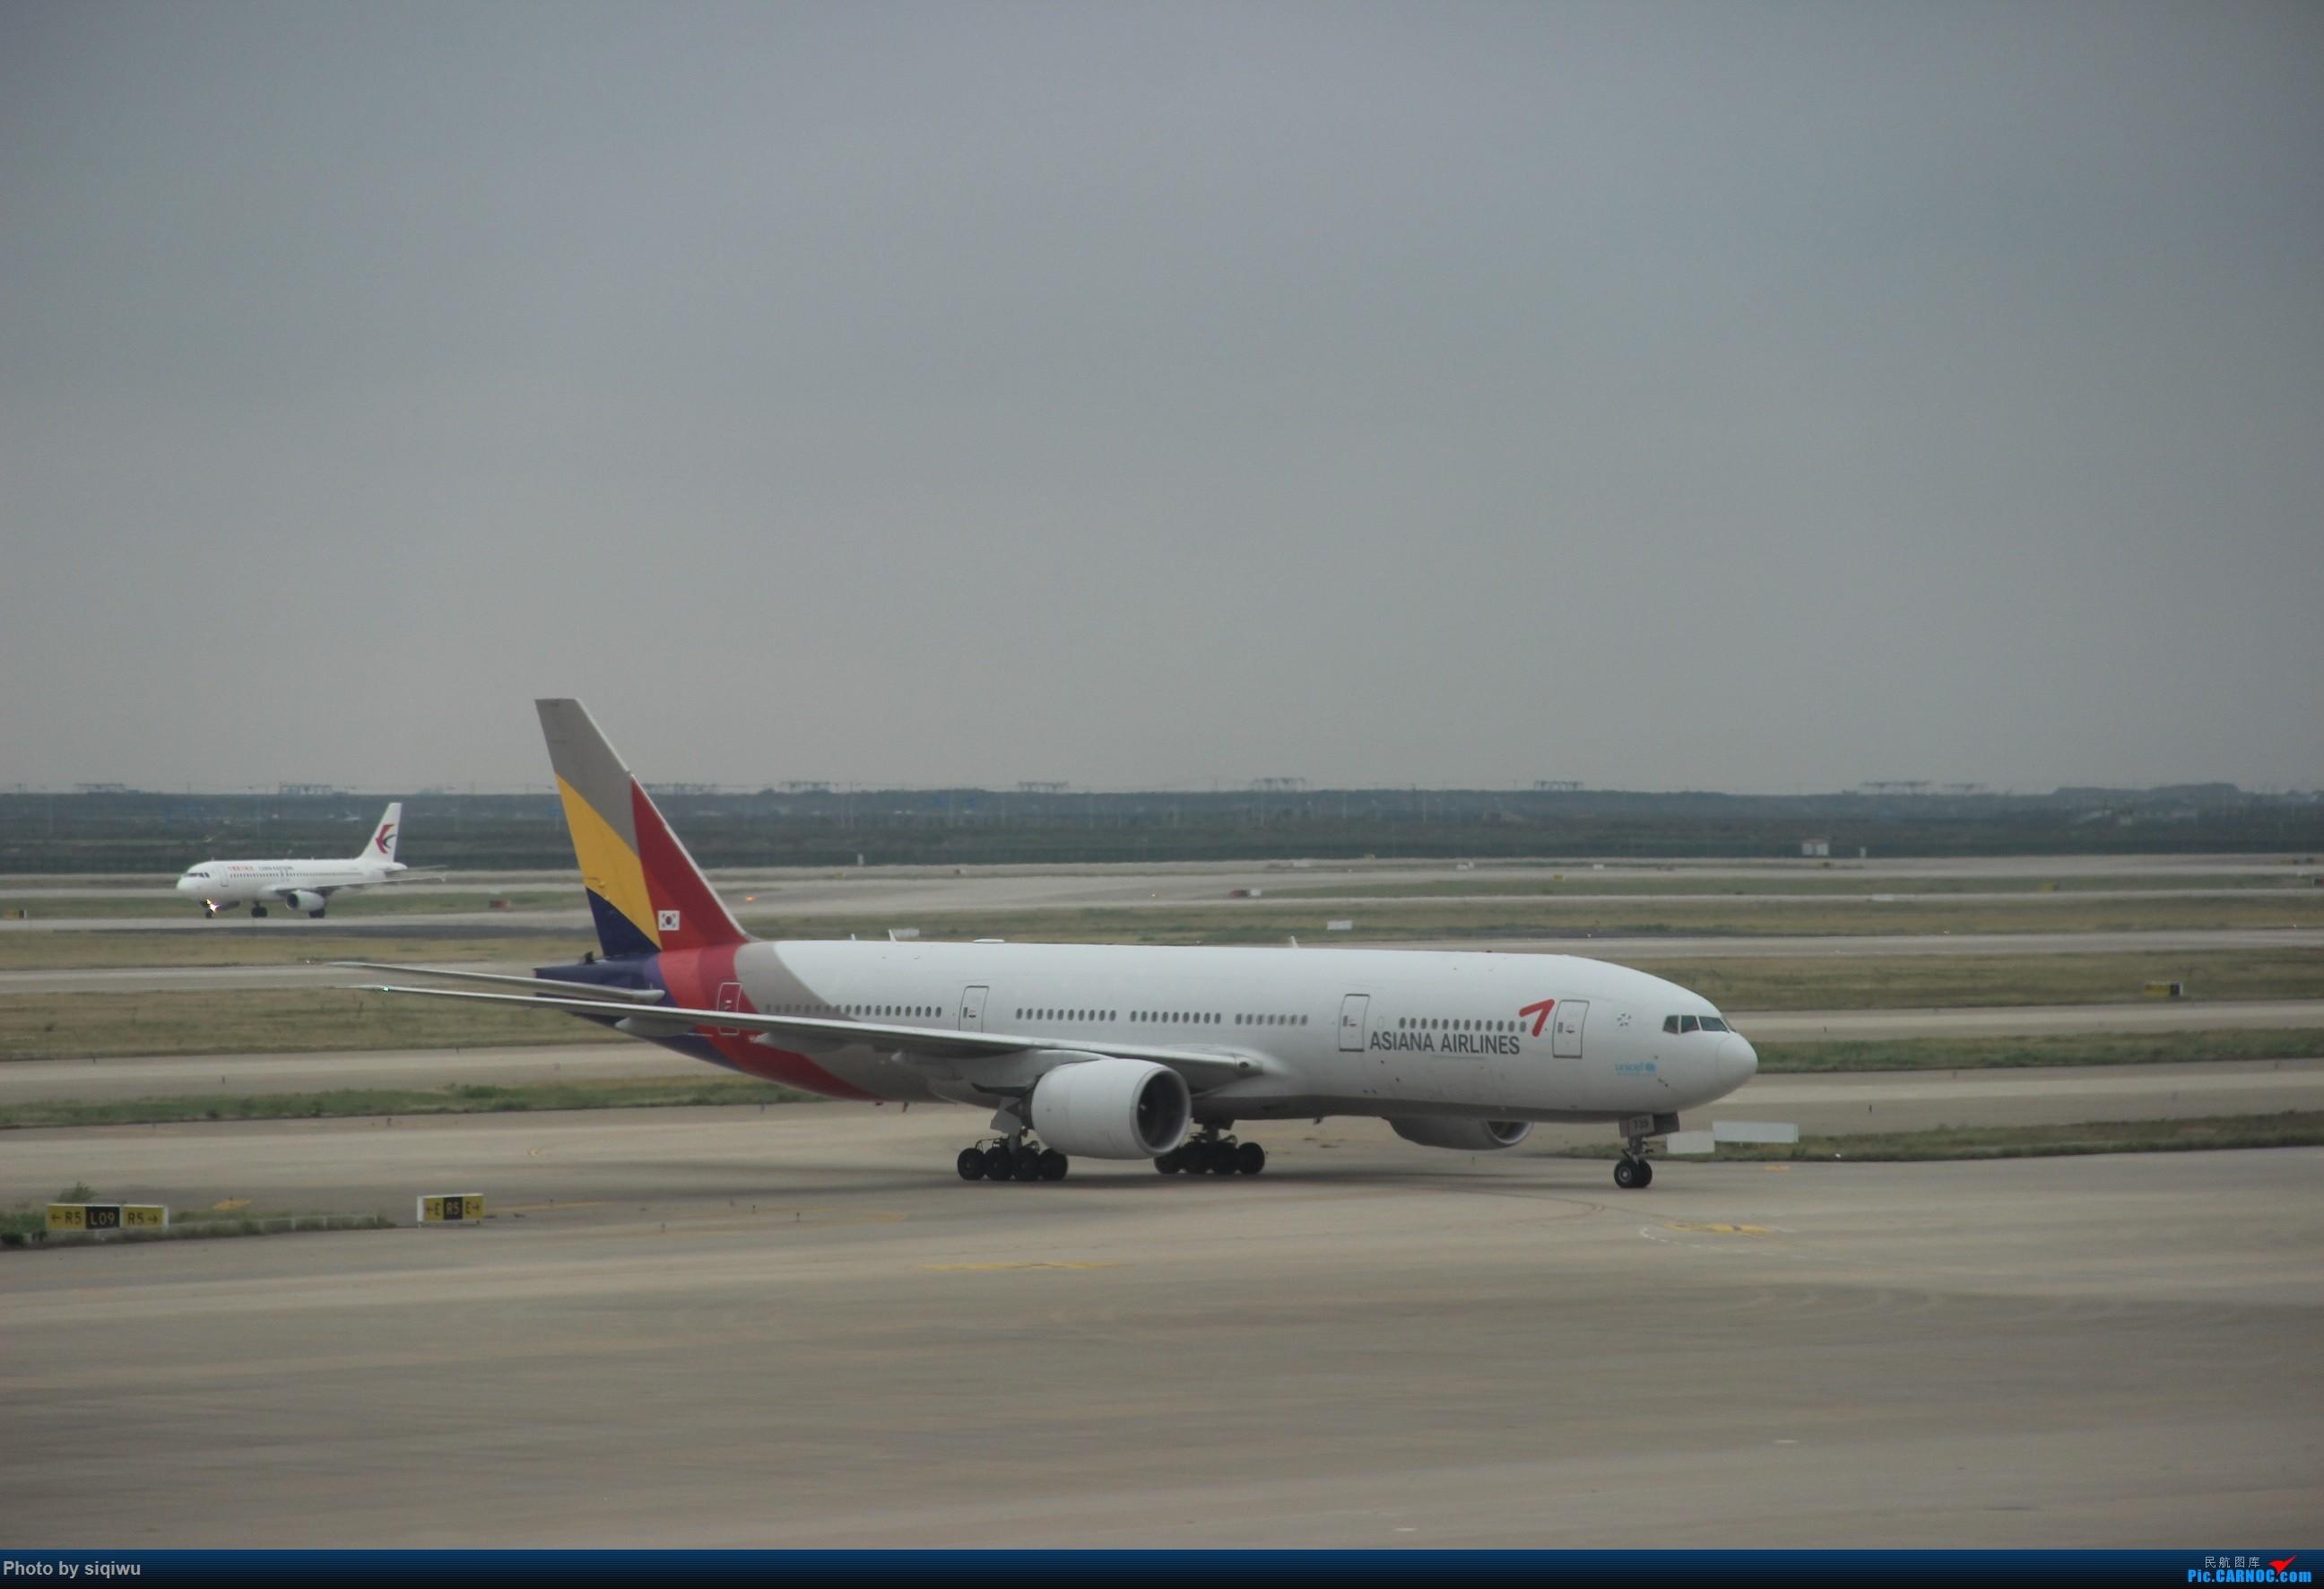 Re:[原创]PVG-HKG-KUL-HKG-PVG 四天往返,CX/KA BOEING 777-200  中国上海浦东国际机场